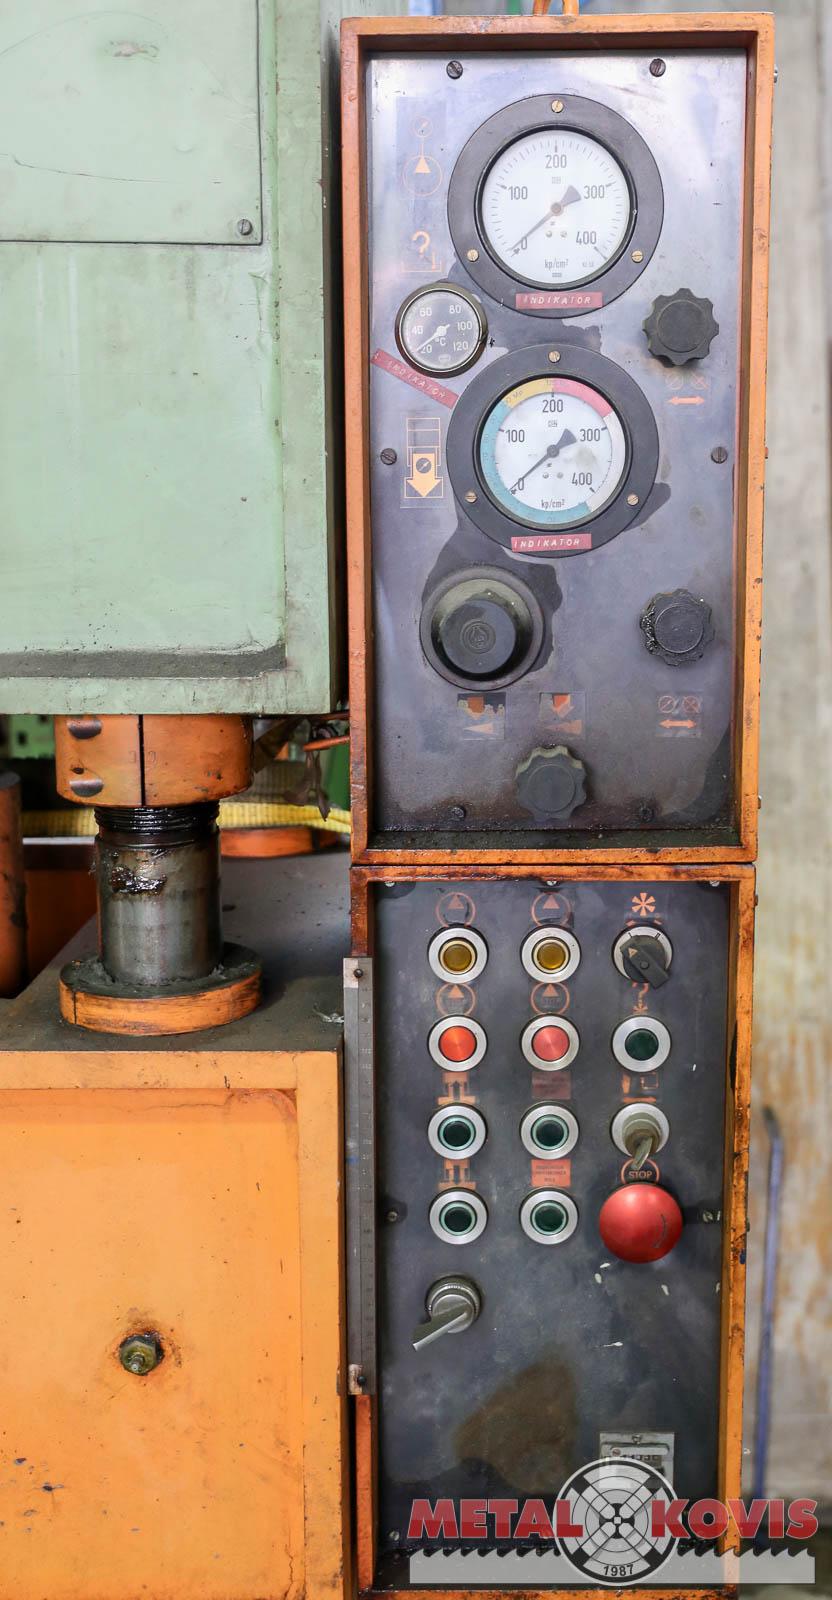 Hidraulična preša Litostroj 100t HPS-1-100-400-800-630-2